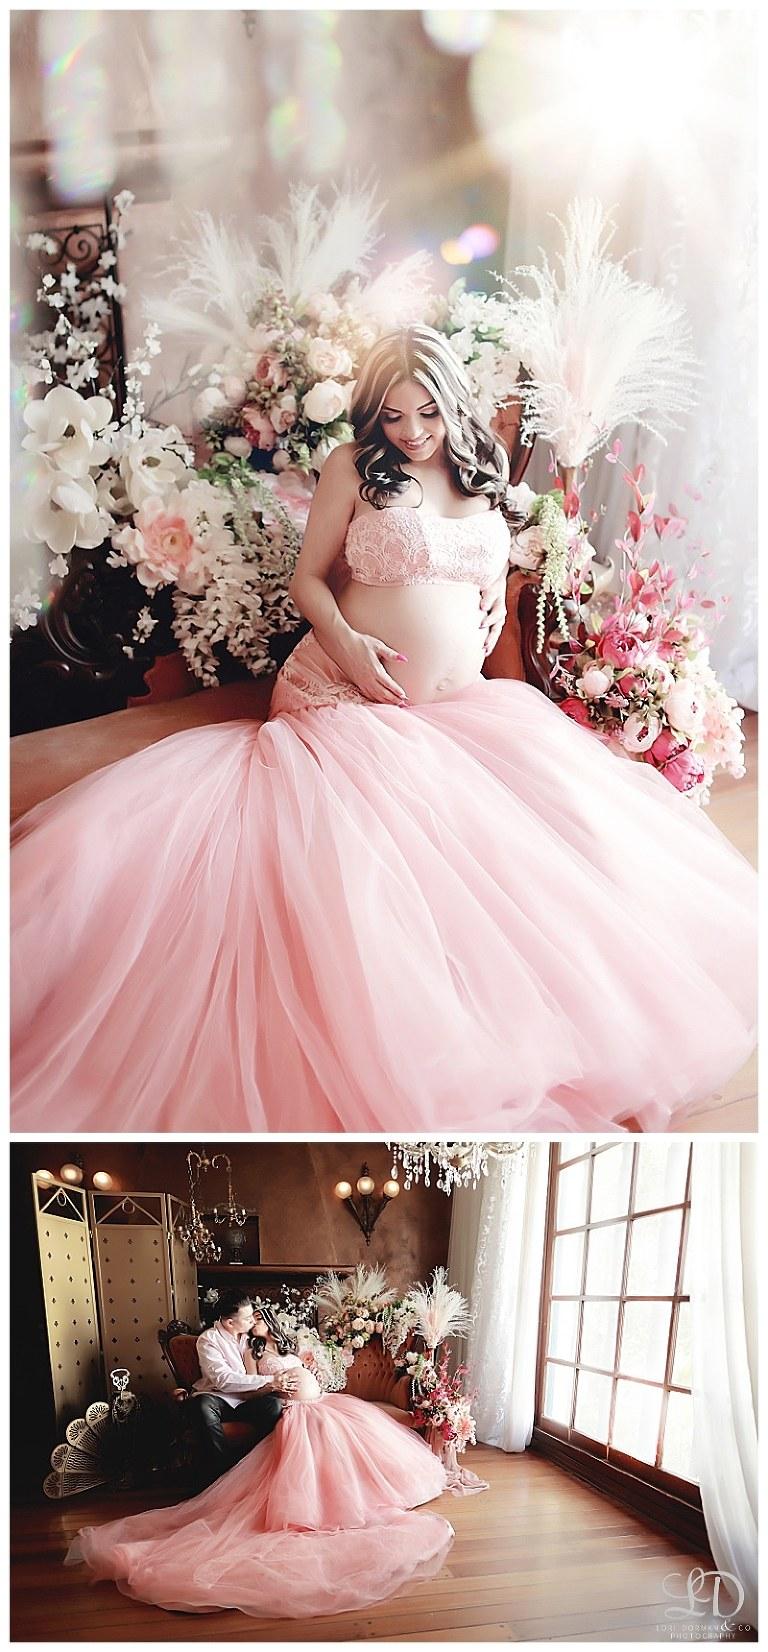 sweet maternity photoshoot-lori dorman photography-maternity boudoir-professional photographer_5840.jpg